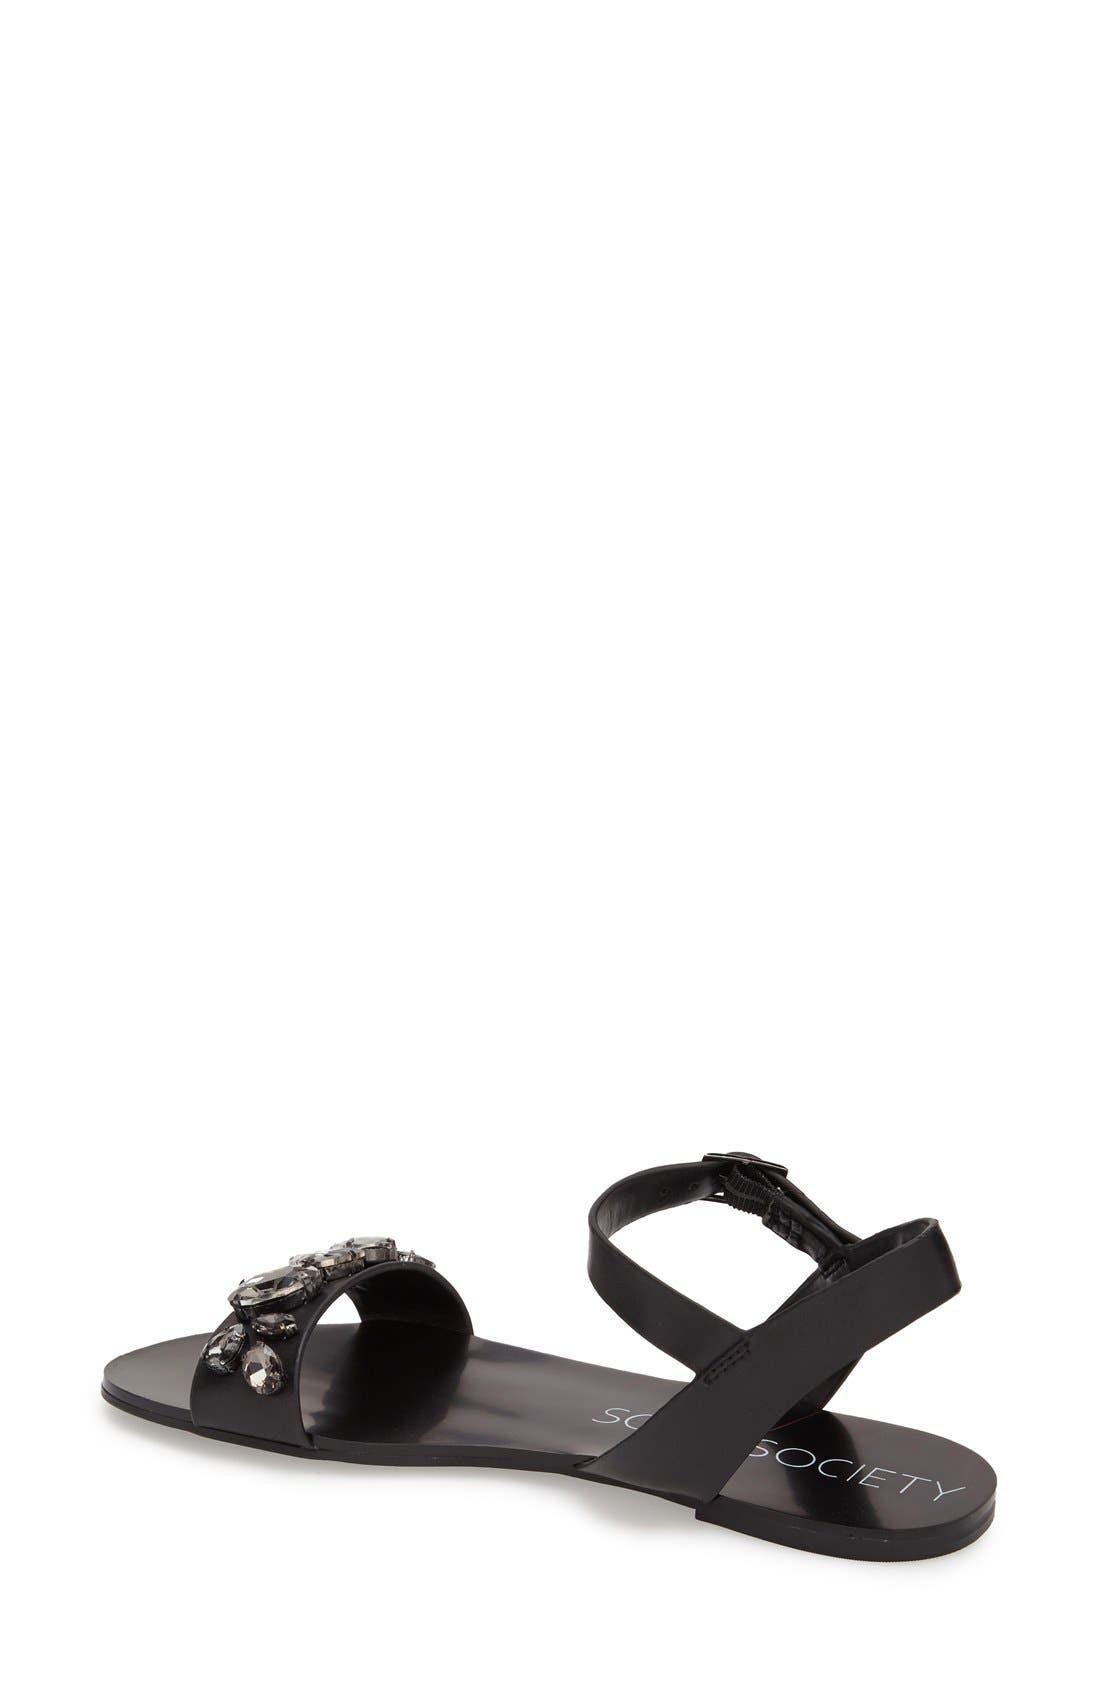 SOLE SOCIETY, 'Gemma' Crystal Ankle Strap Sandal, Alternate thumbnail 3, color, 001